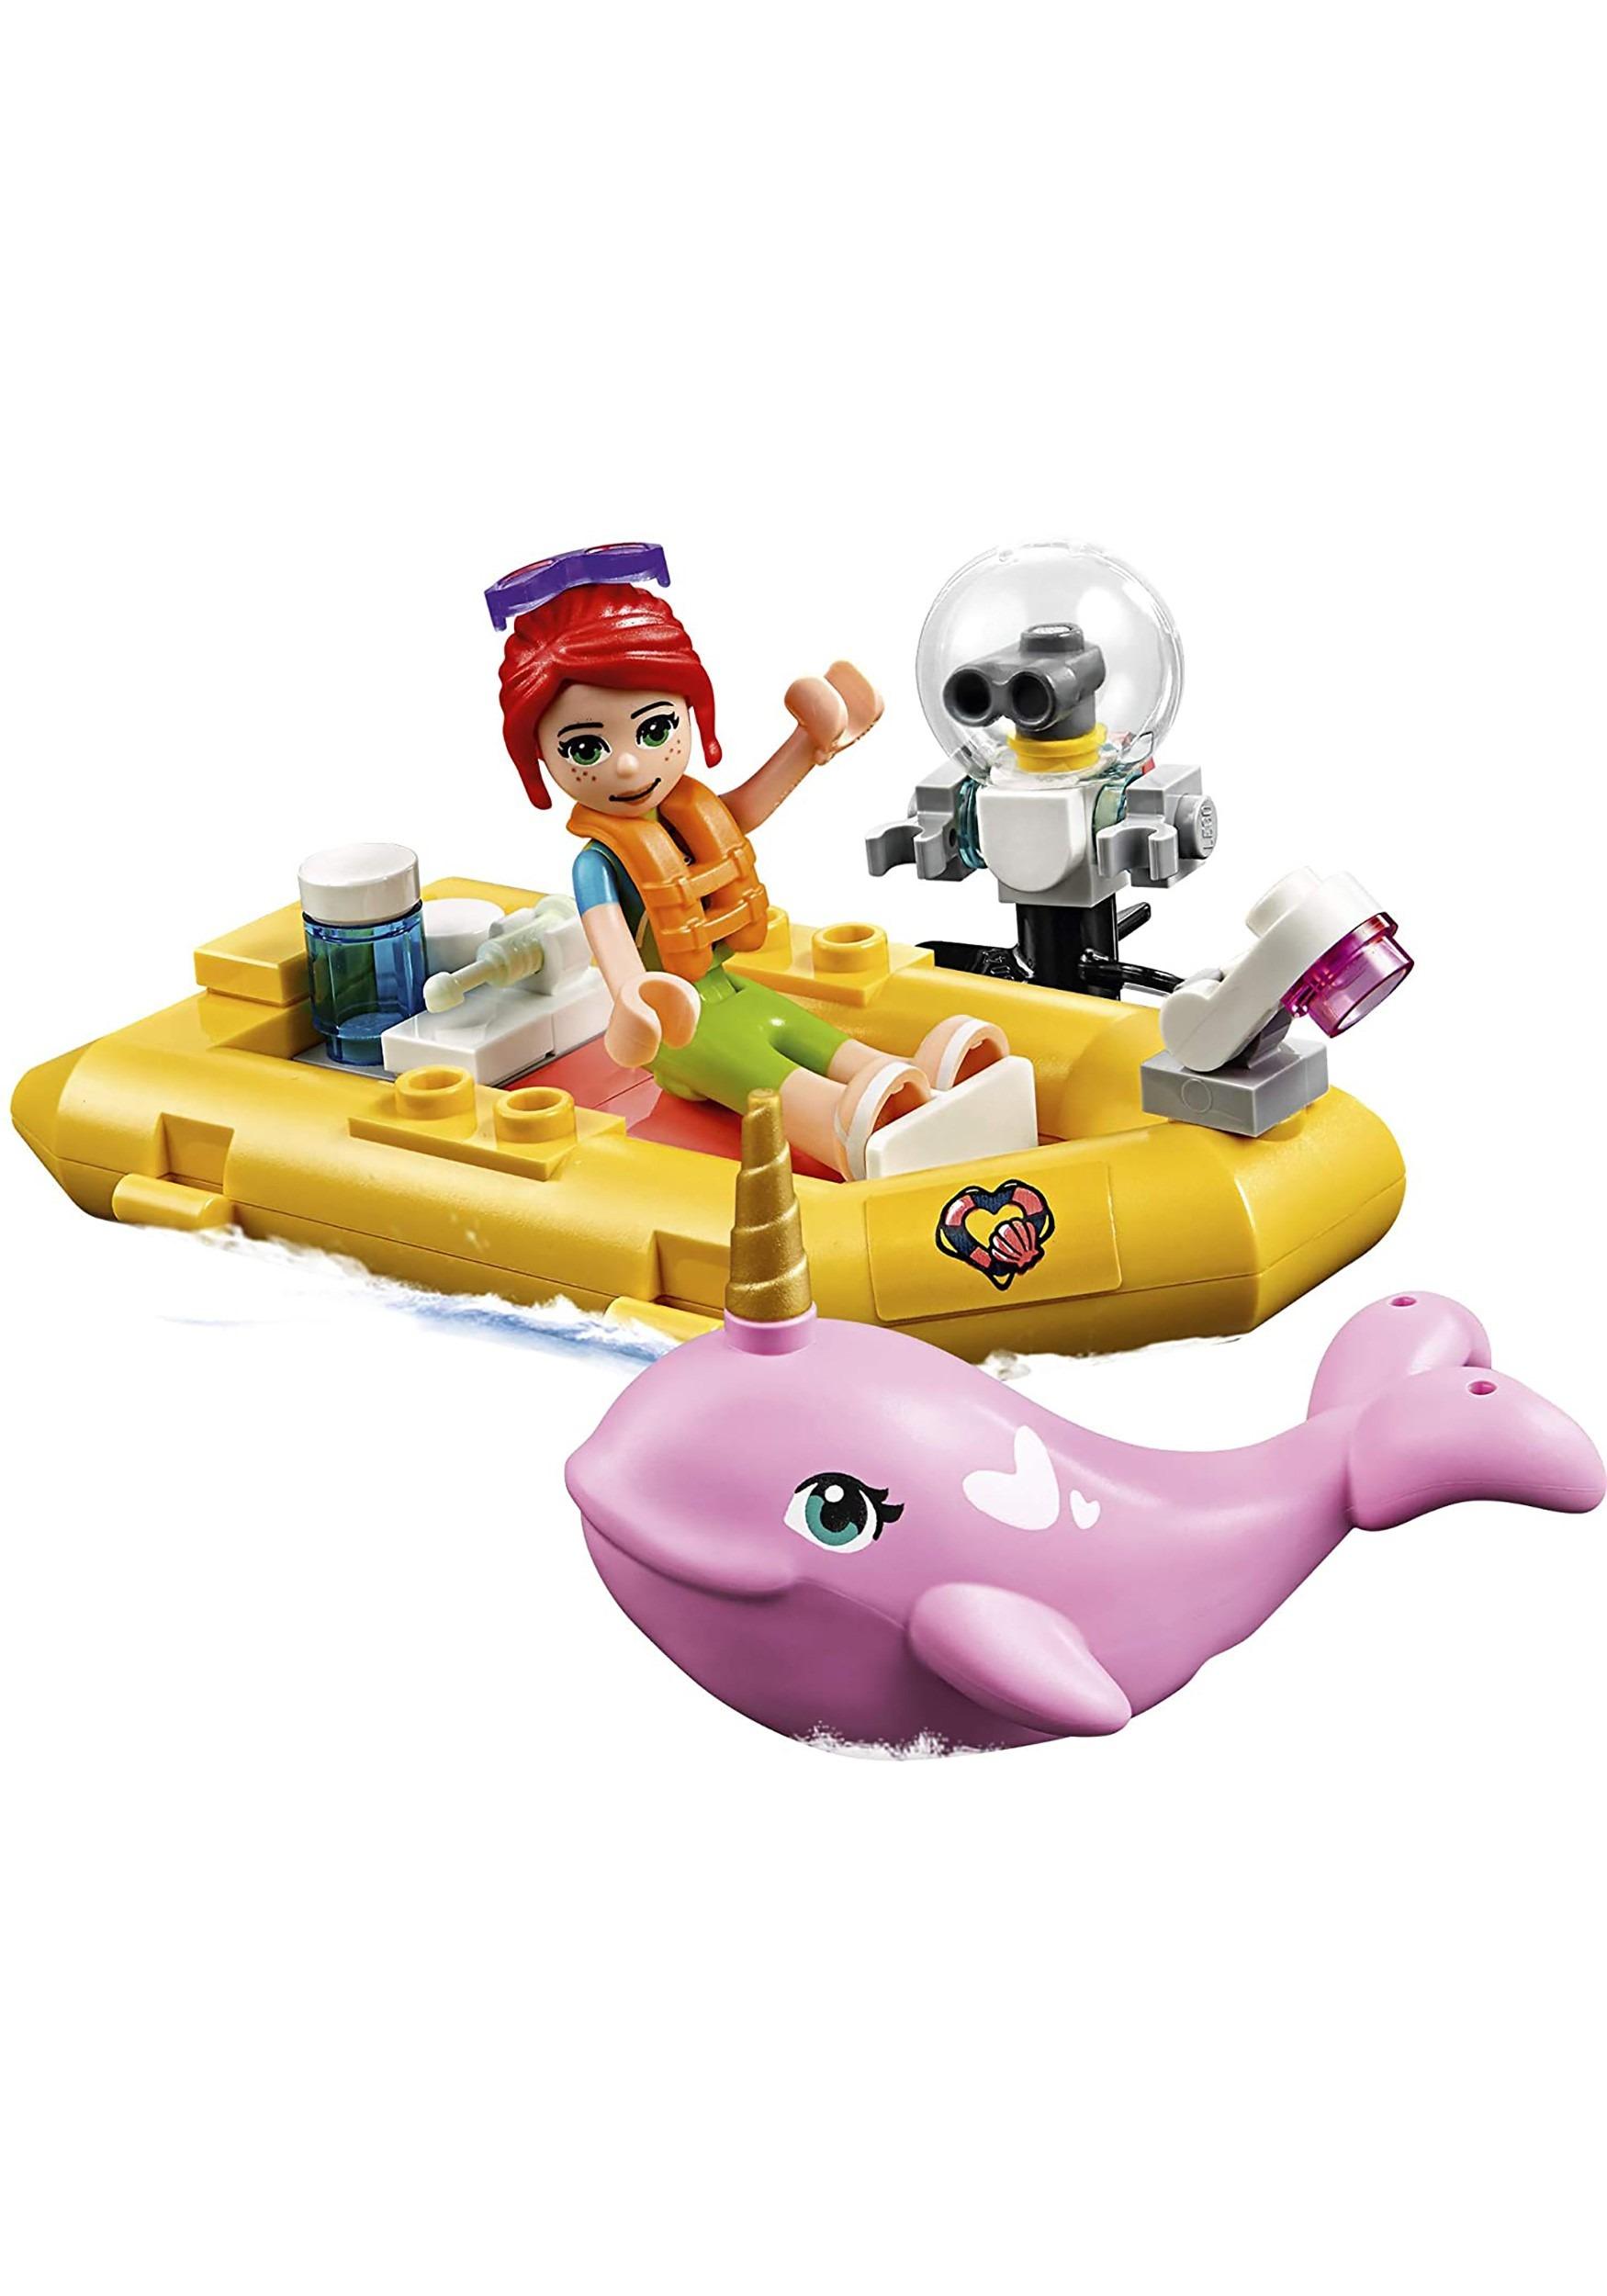 Rescue Mission Boat LEGO Friends Building Set